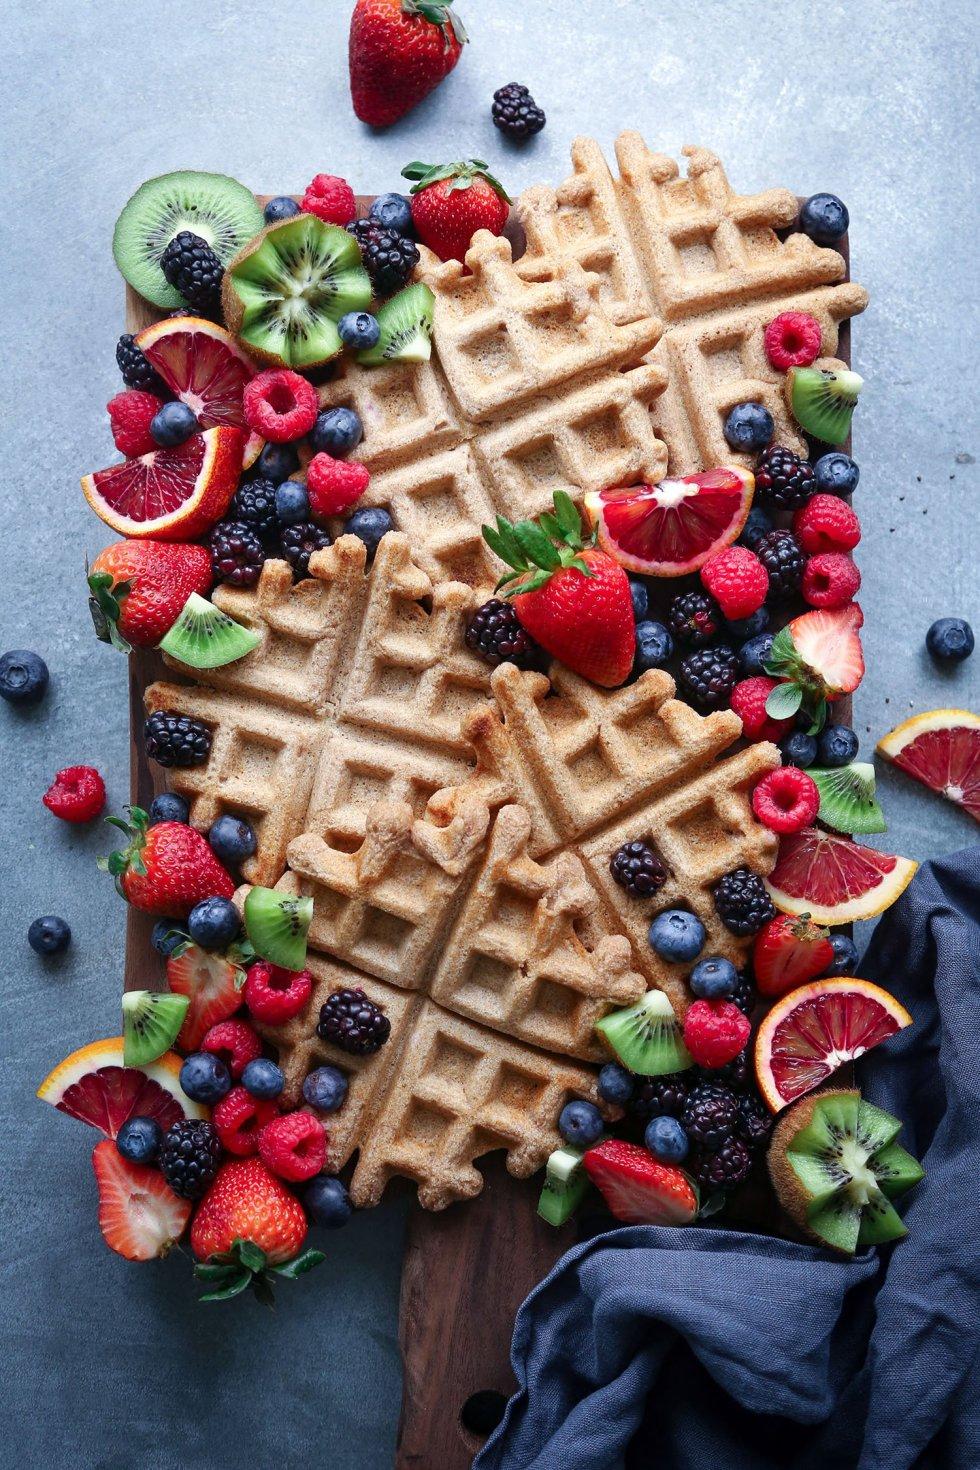 Simple Spelt Waffles | Refined Sugar Free and Vegan Friendly | Wife Mama Foodie